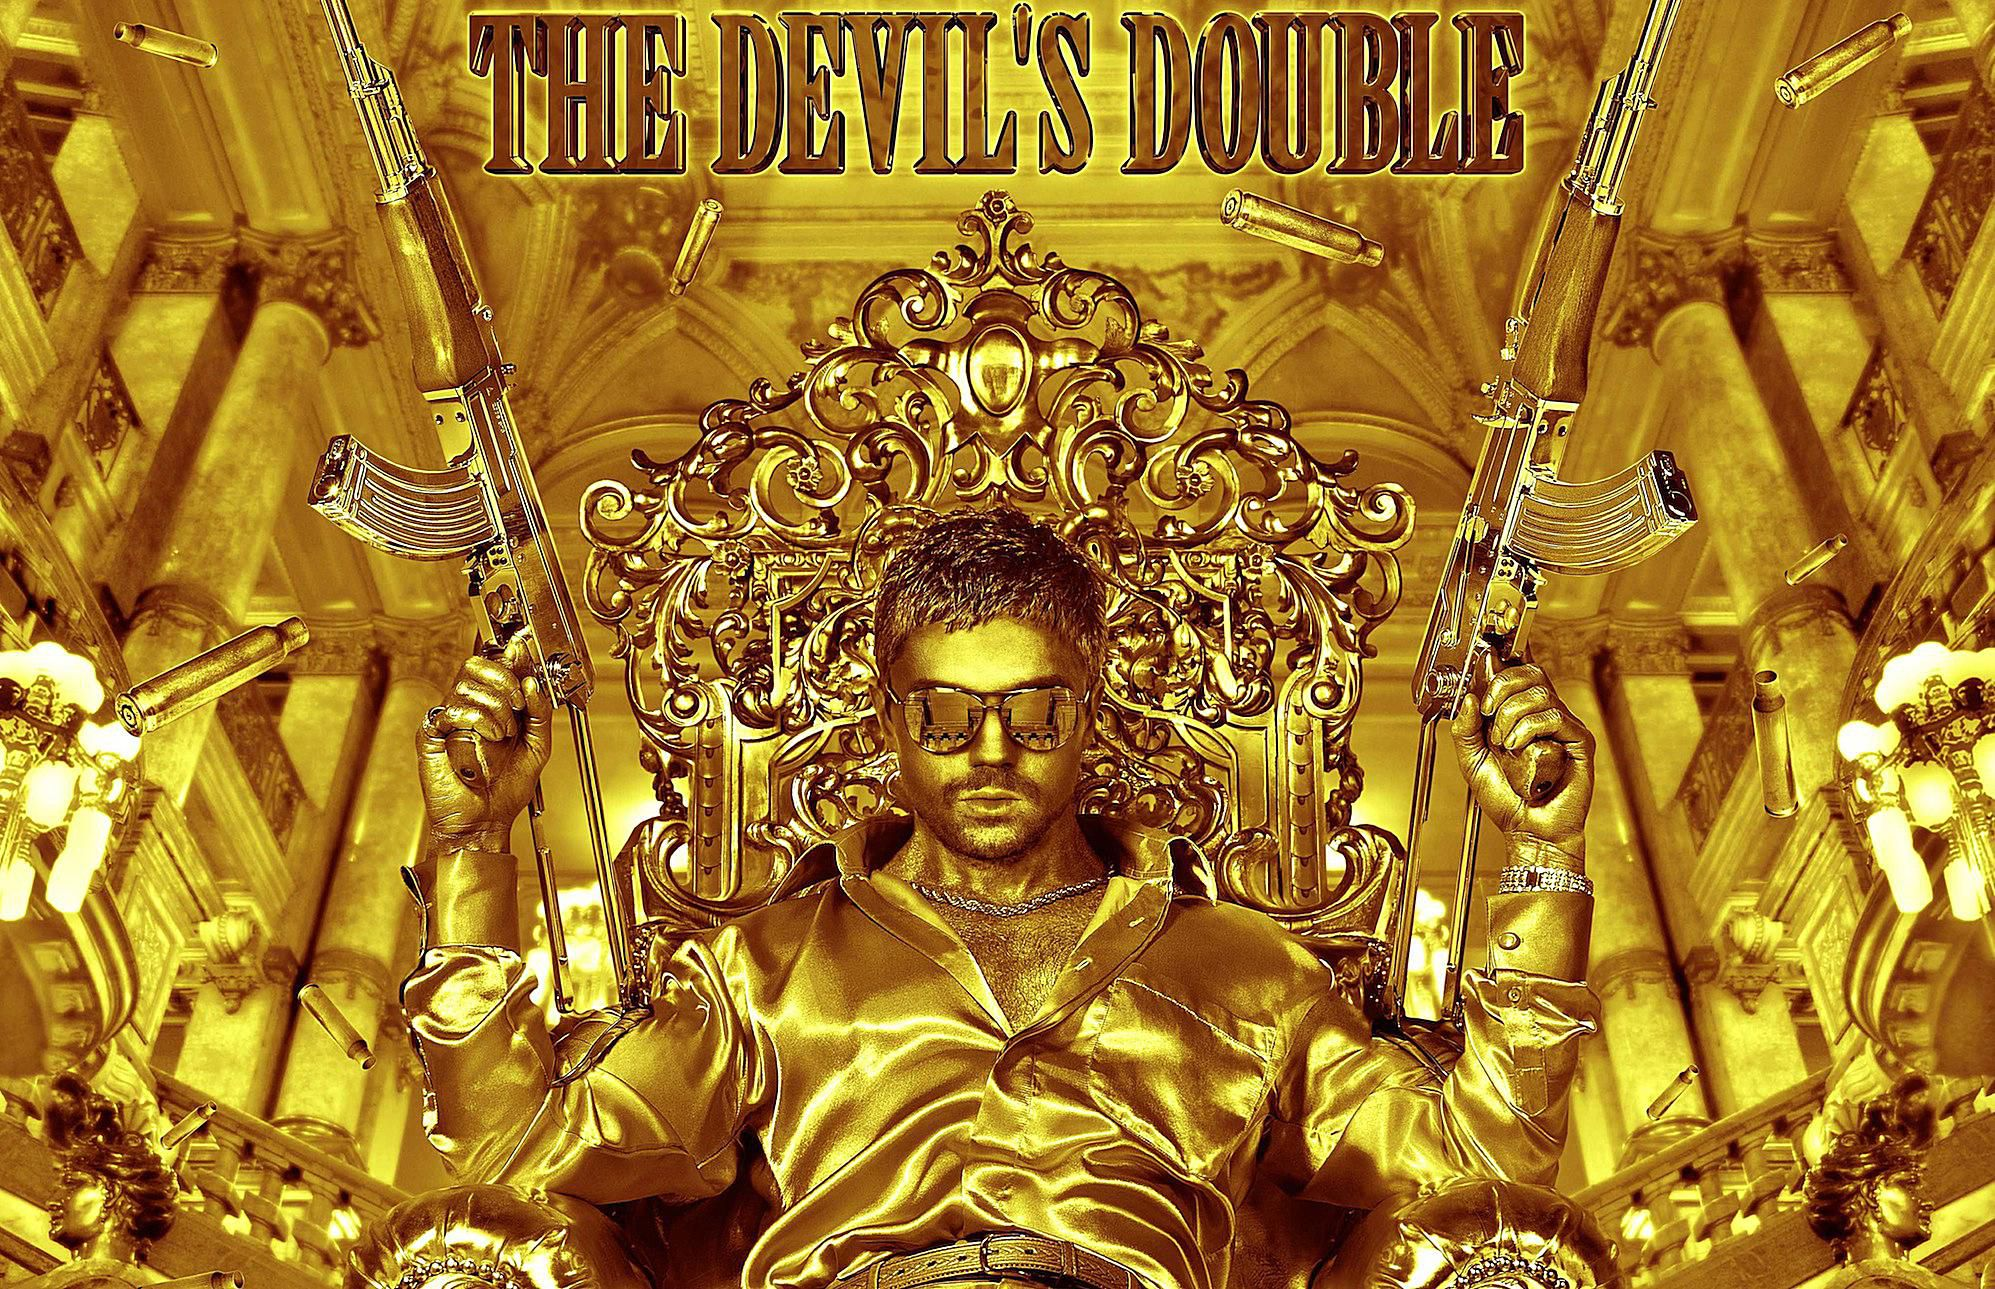 the-devils-double-movie-Michael-John-Fedun.jpg